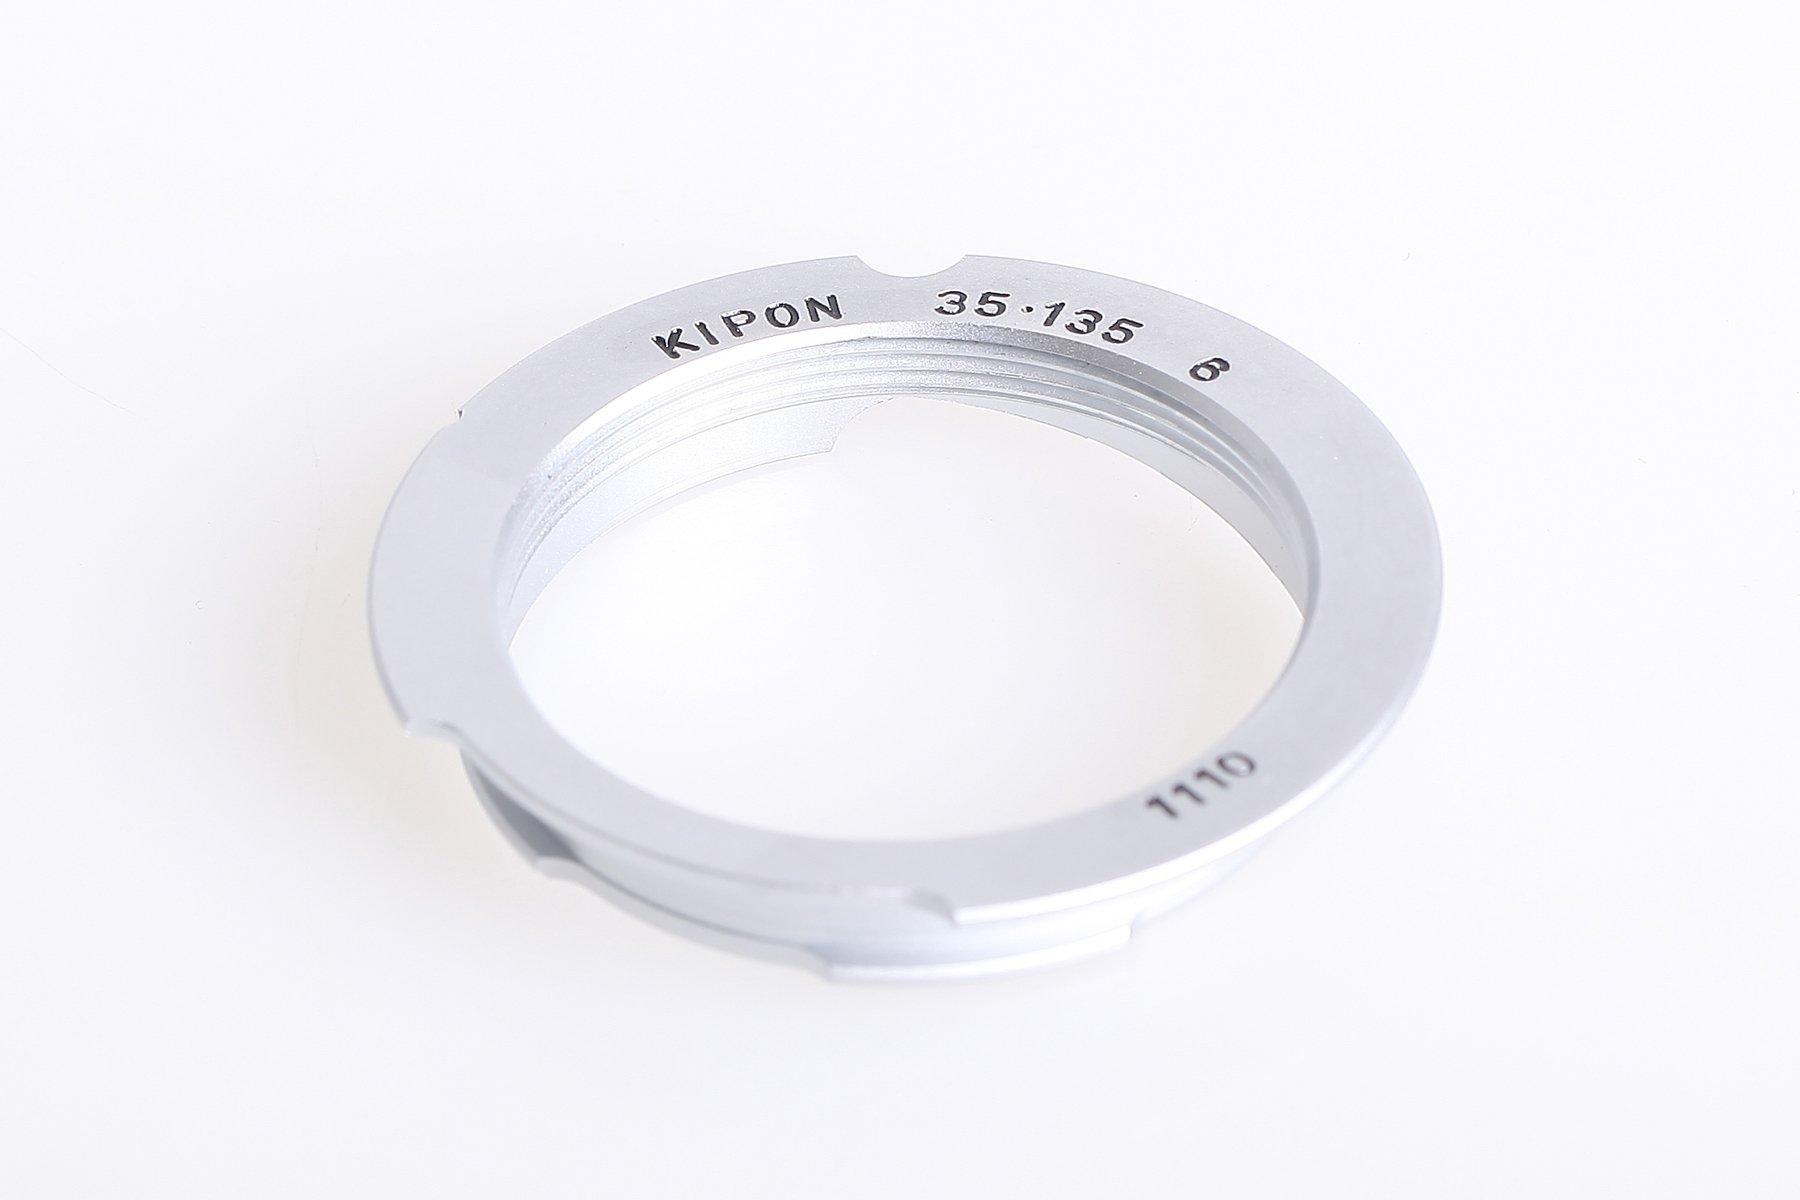 KIPON adaptér objektivu M39 na tělo Leica M pro ohnisko 35/135 mm - 6 bit